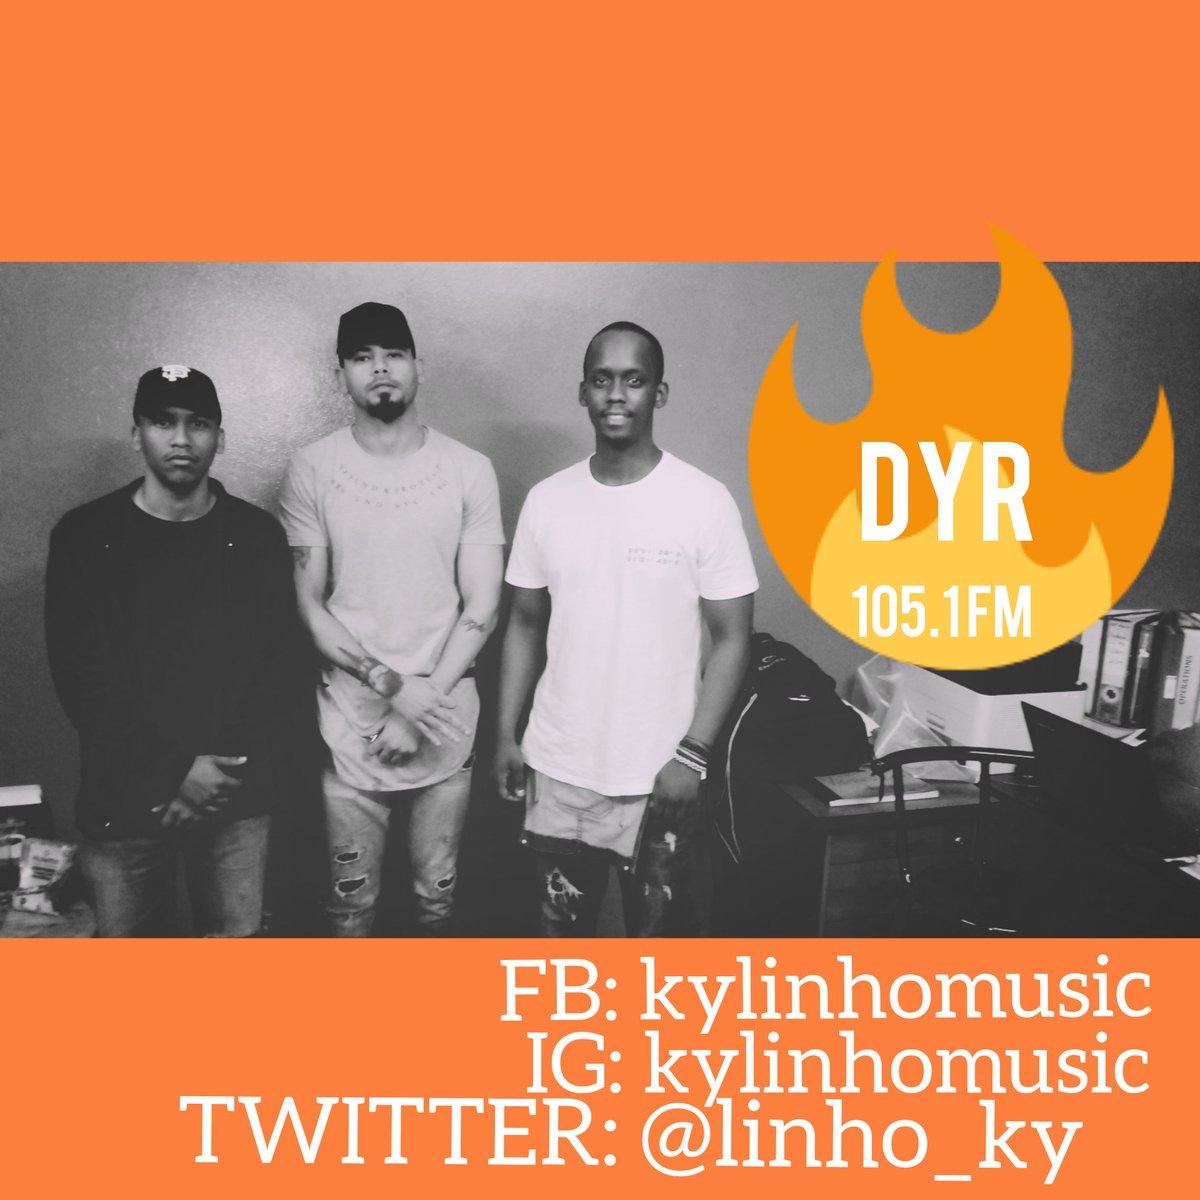 Thanks to @DYR1051 / @DYRFM  for the dope #interview lastnight #freestyle #rap #hiphop #Durban #igers #SynergyTheEP  https:// goo.gl/JJ67KH  &nbsp;  <br>http://pic.twitter.com/6Uv5ZsZKbW